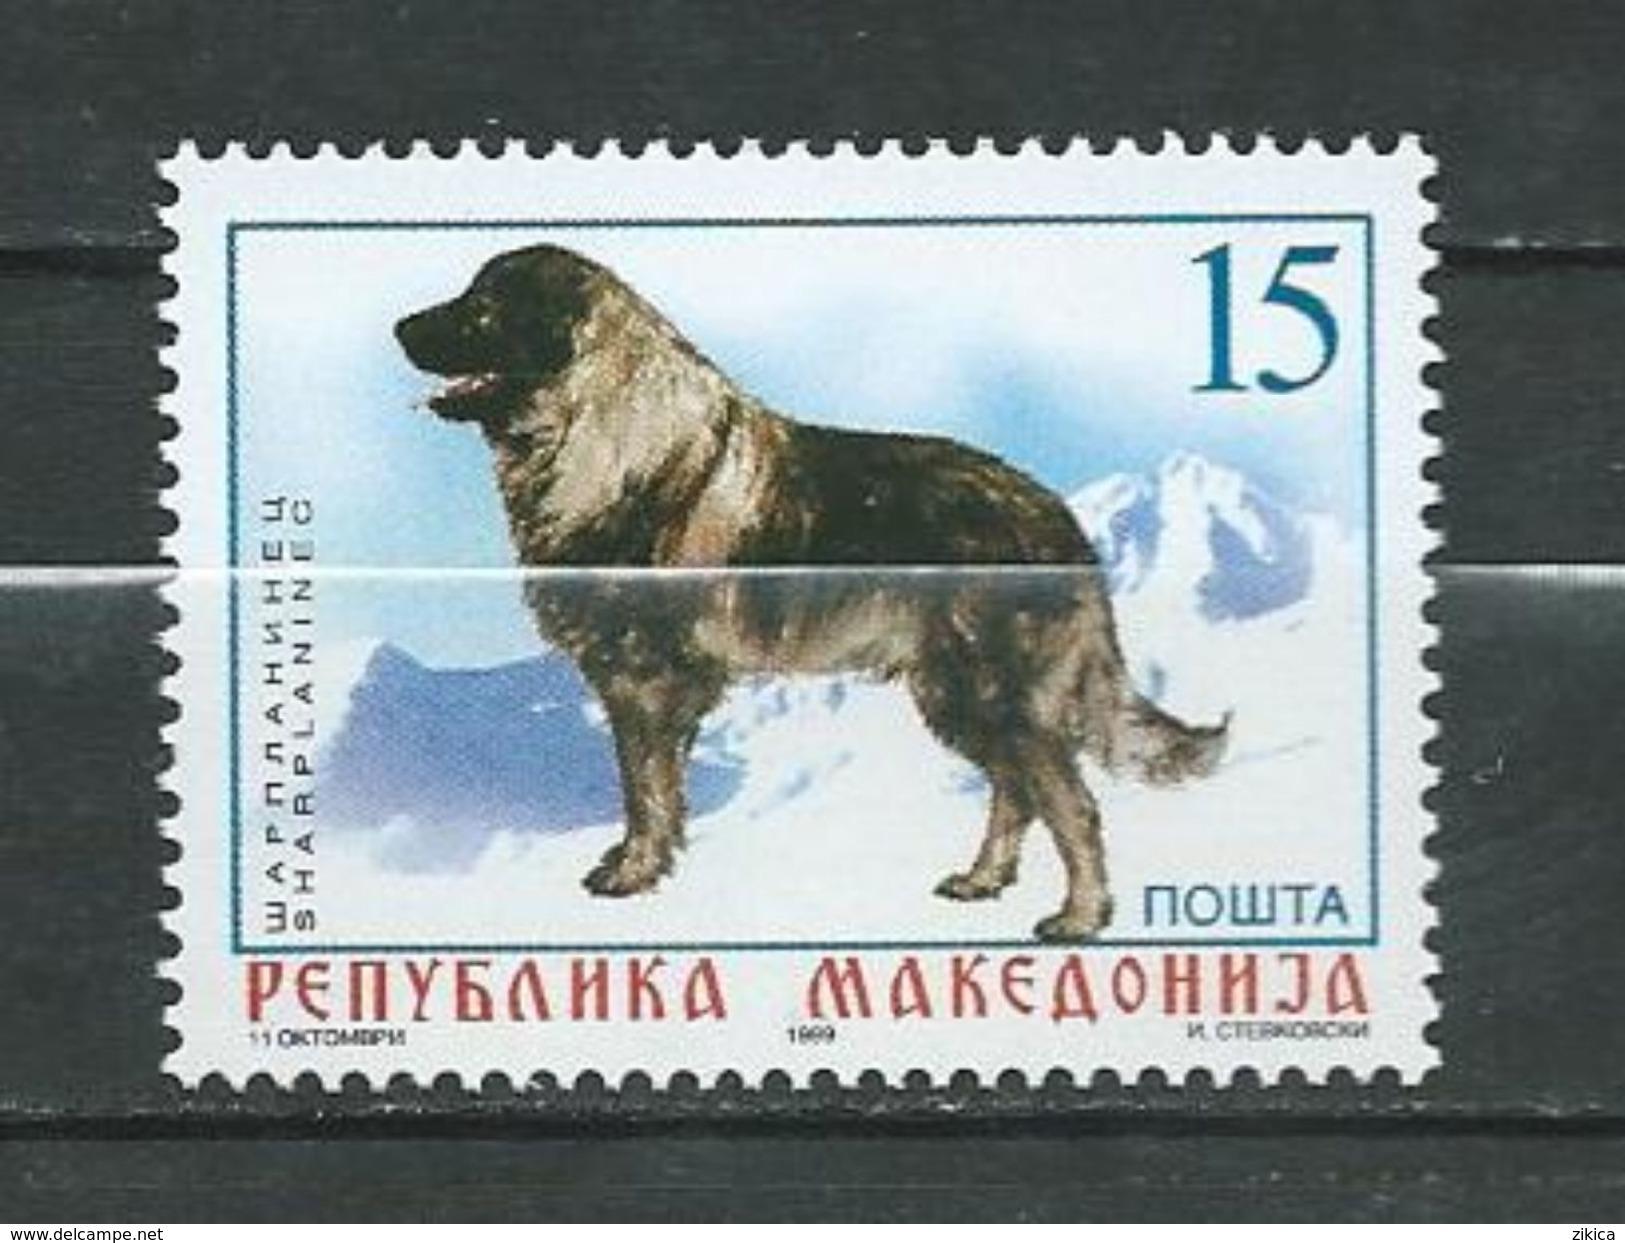 Macedonia / Macedonie 1999 Dogs.Chien De Berger Yougoslave De Charplanina. MNH - Macedonia